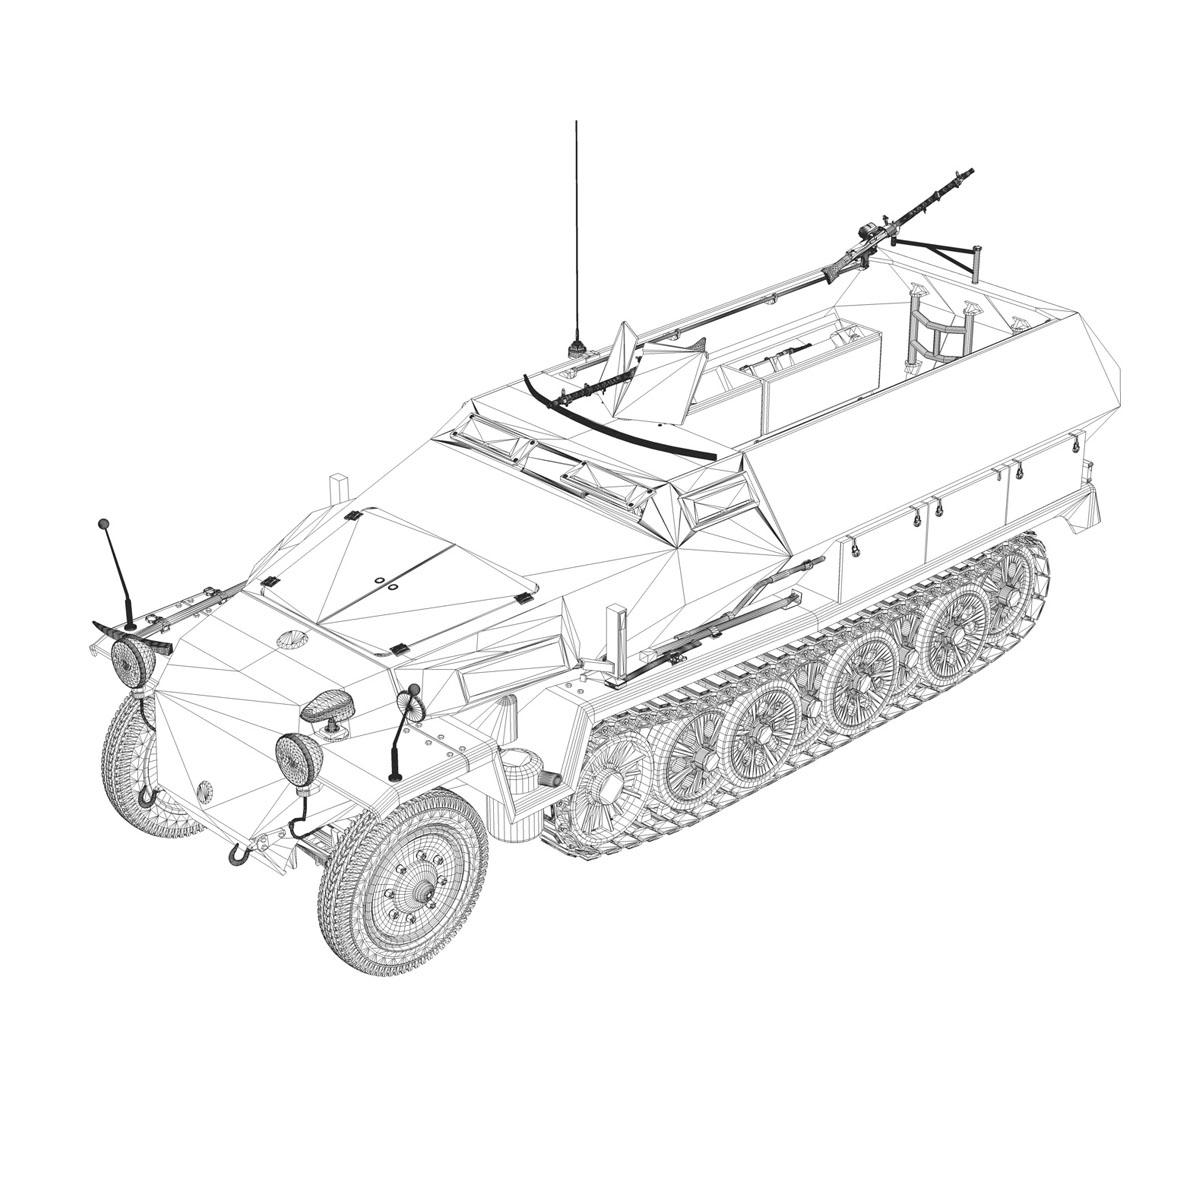 sd.kfz 251/1 ausf.c – hanomag halftruck 3d model 3ds fbx c4d lwo obj 201172